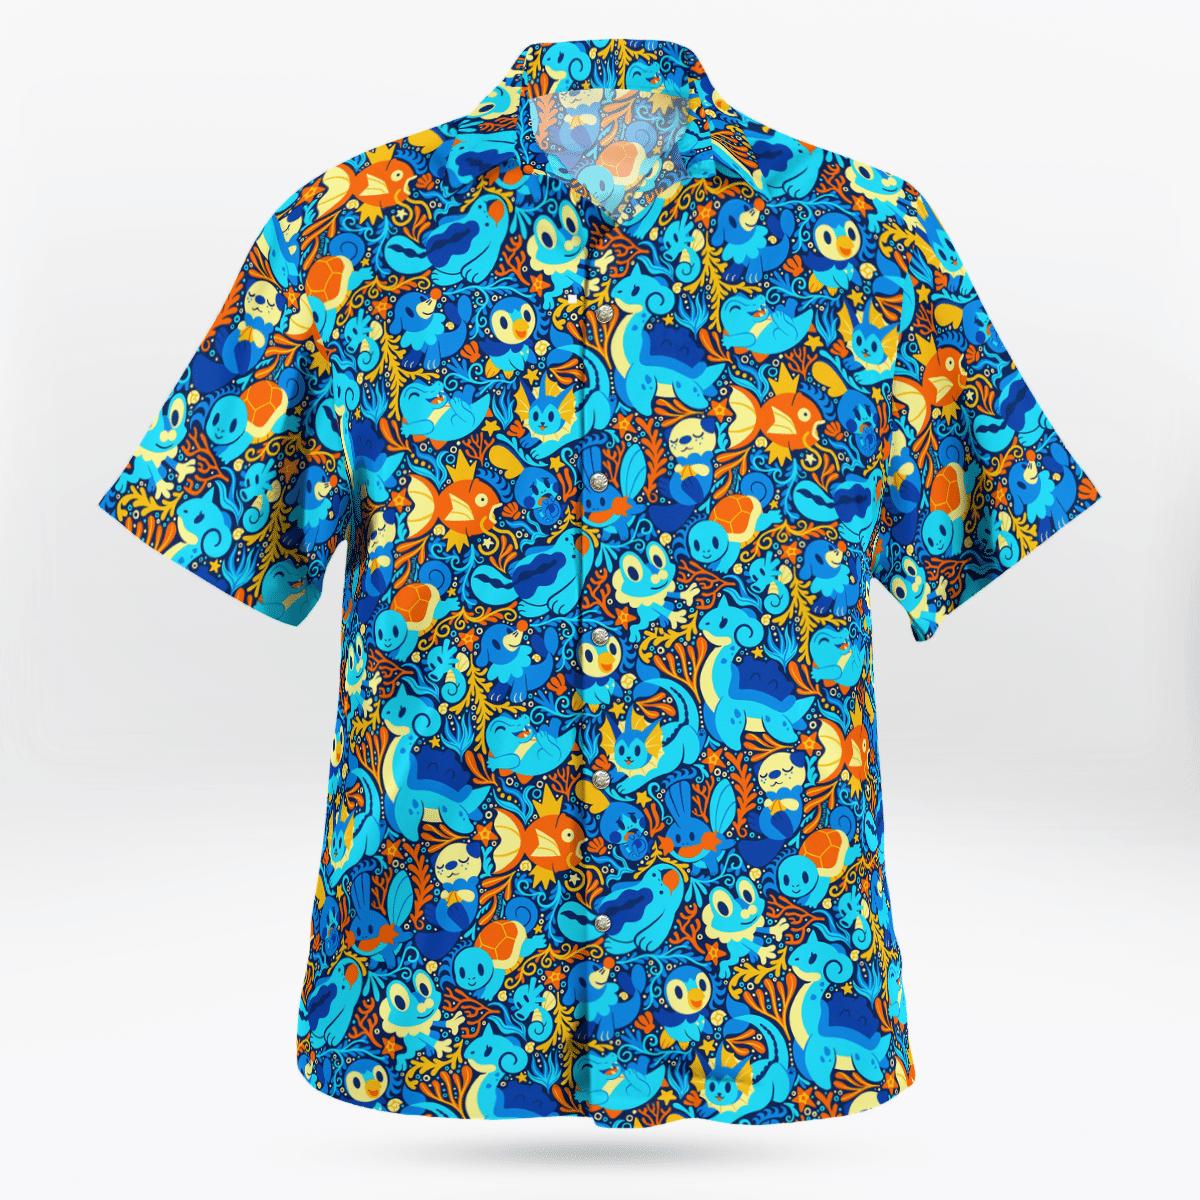 Water Pokemon Hawaiian shirt - LIMITED EDITION